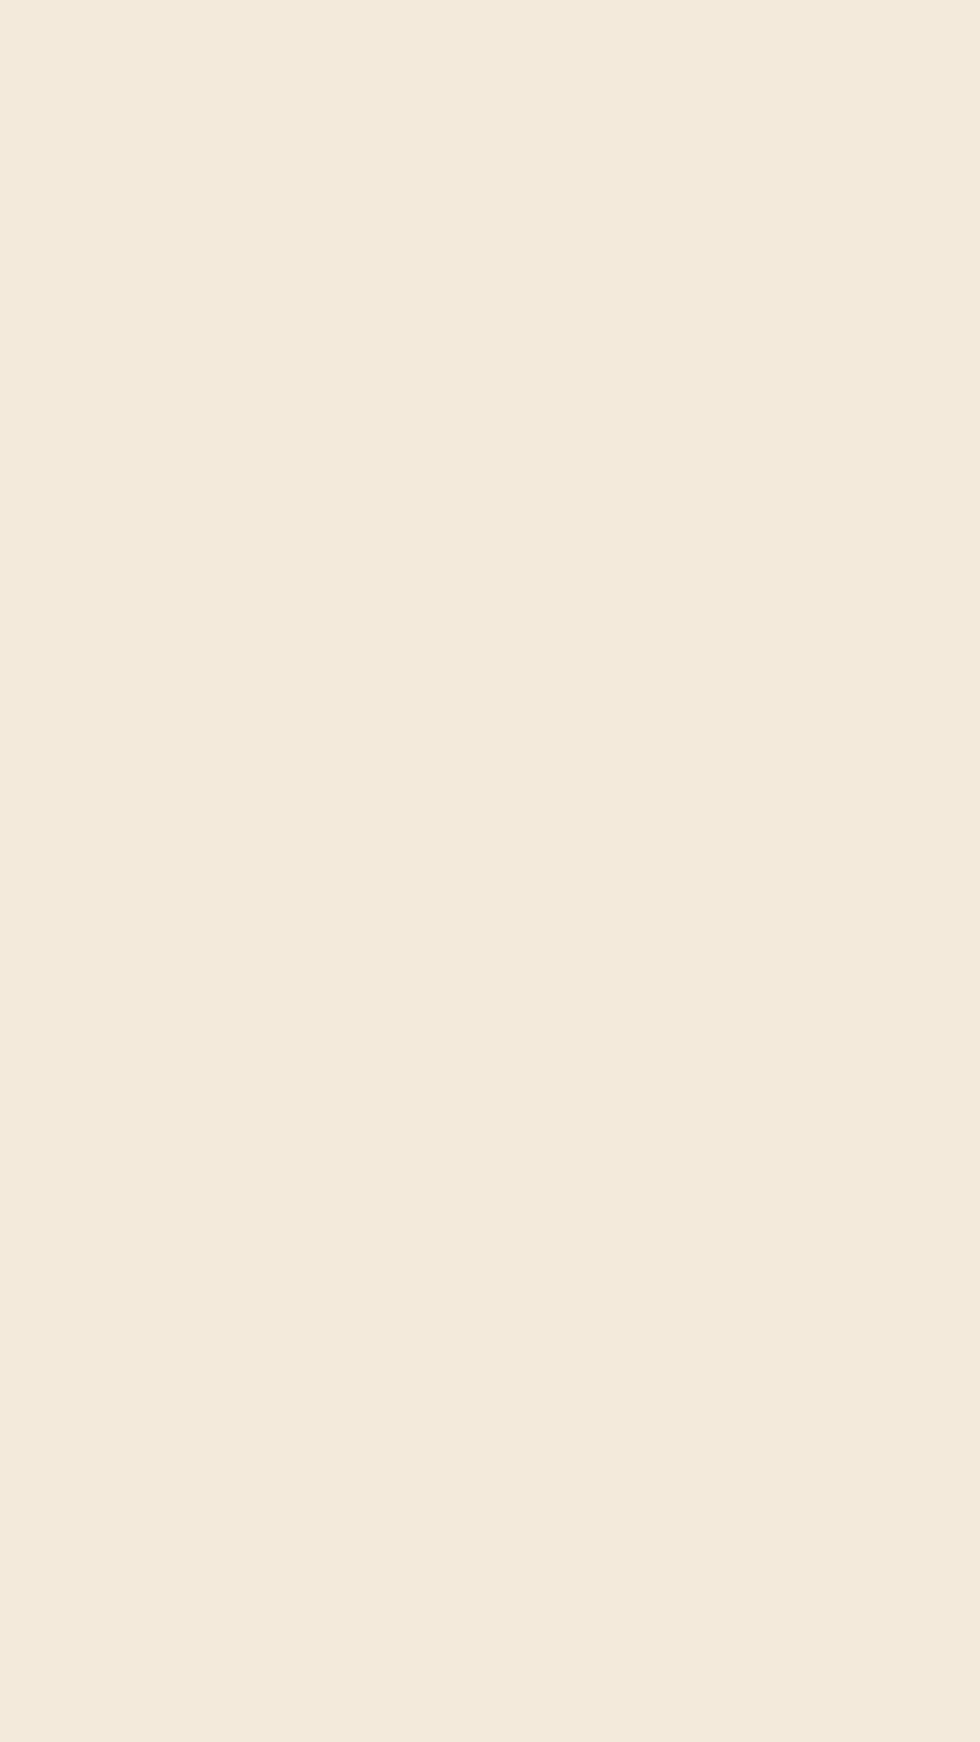 farbe beige.JPG